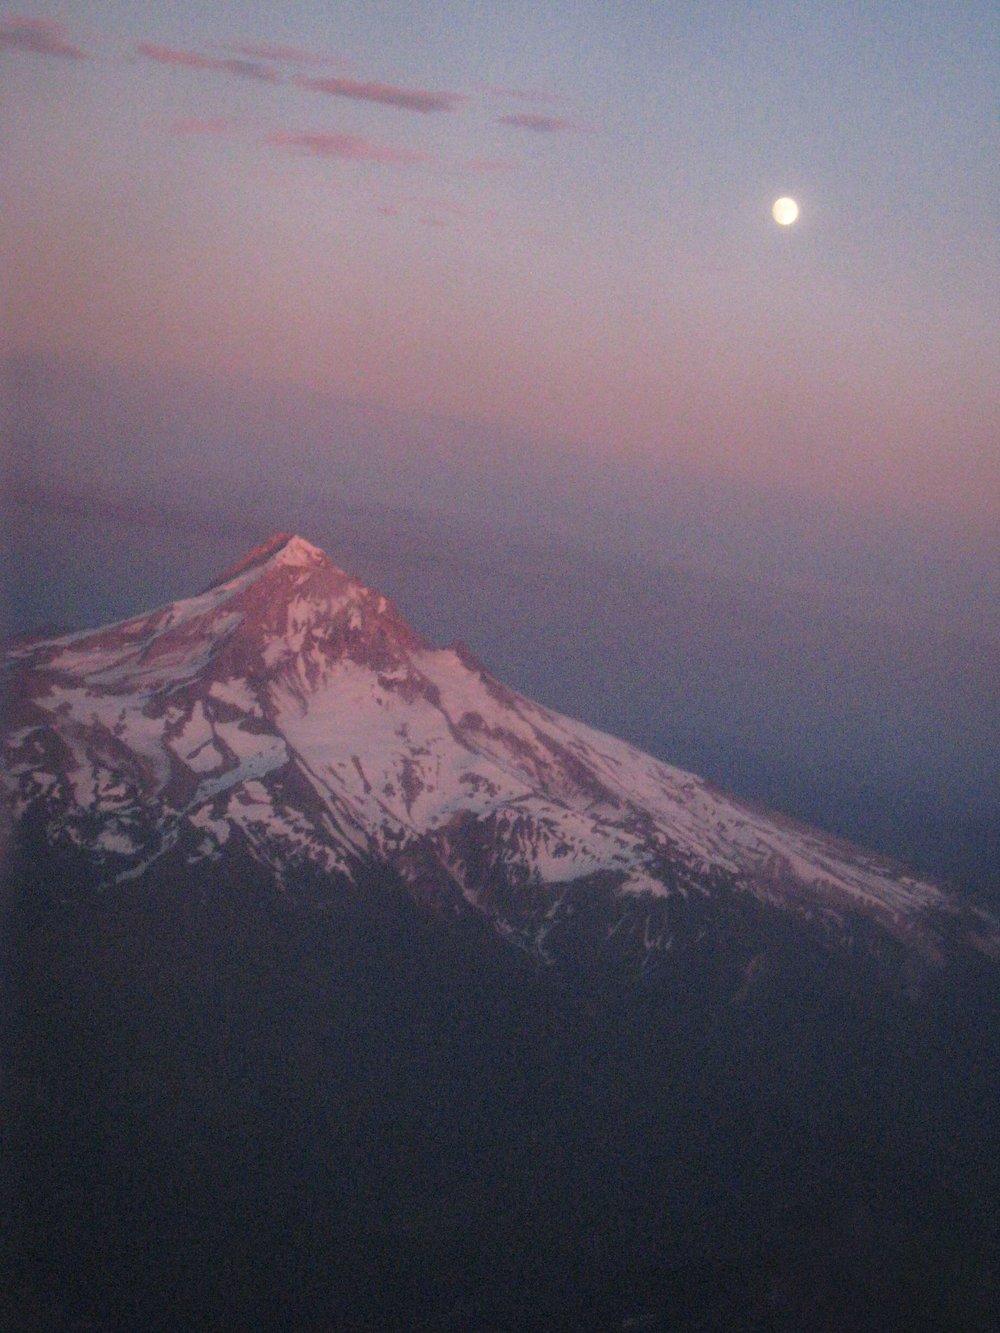 Moon_Mount Hood.jpg